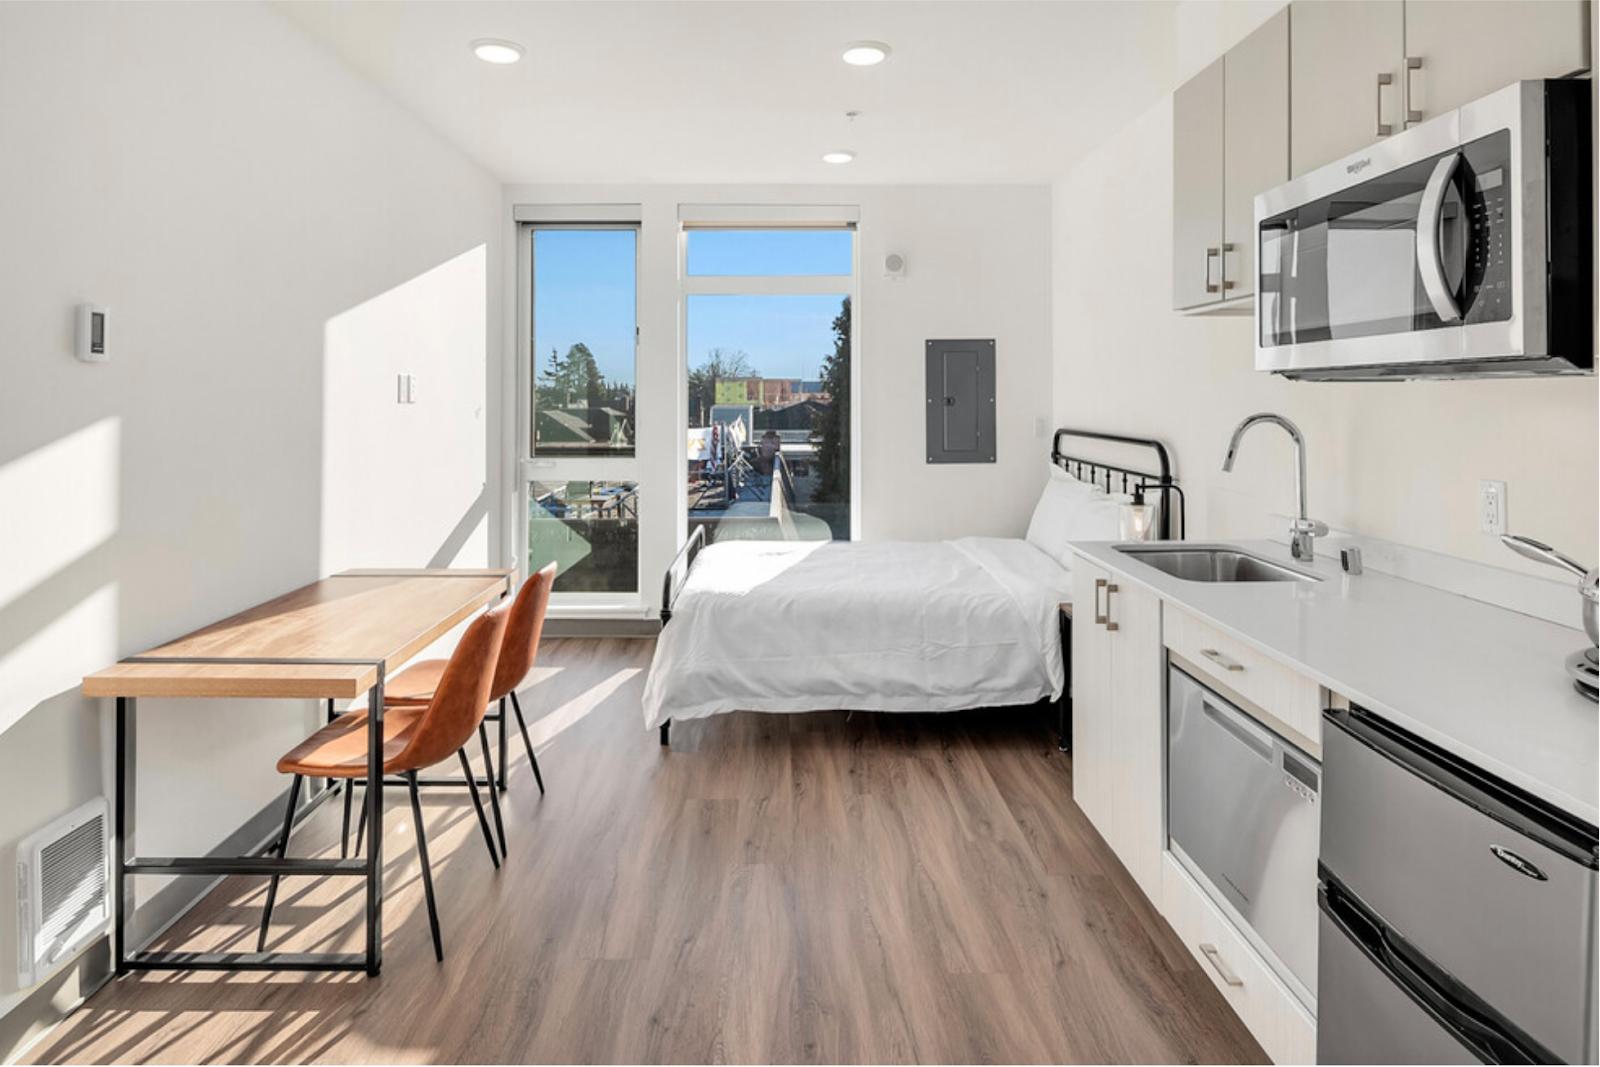 Tripalink apartment setup